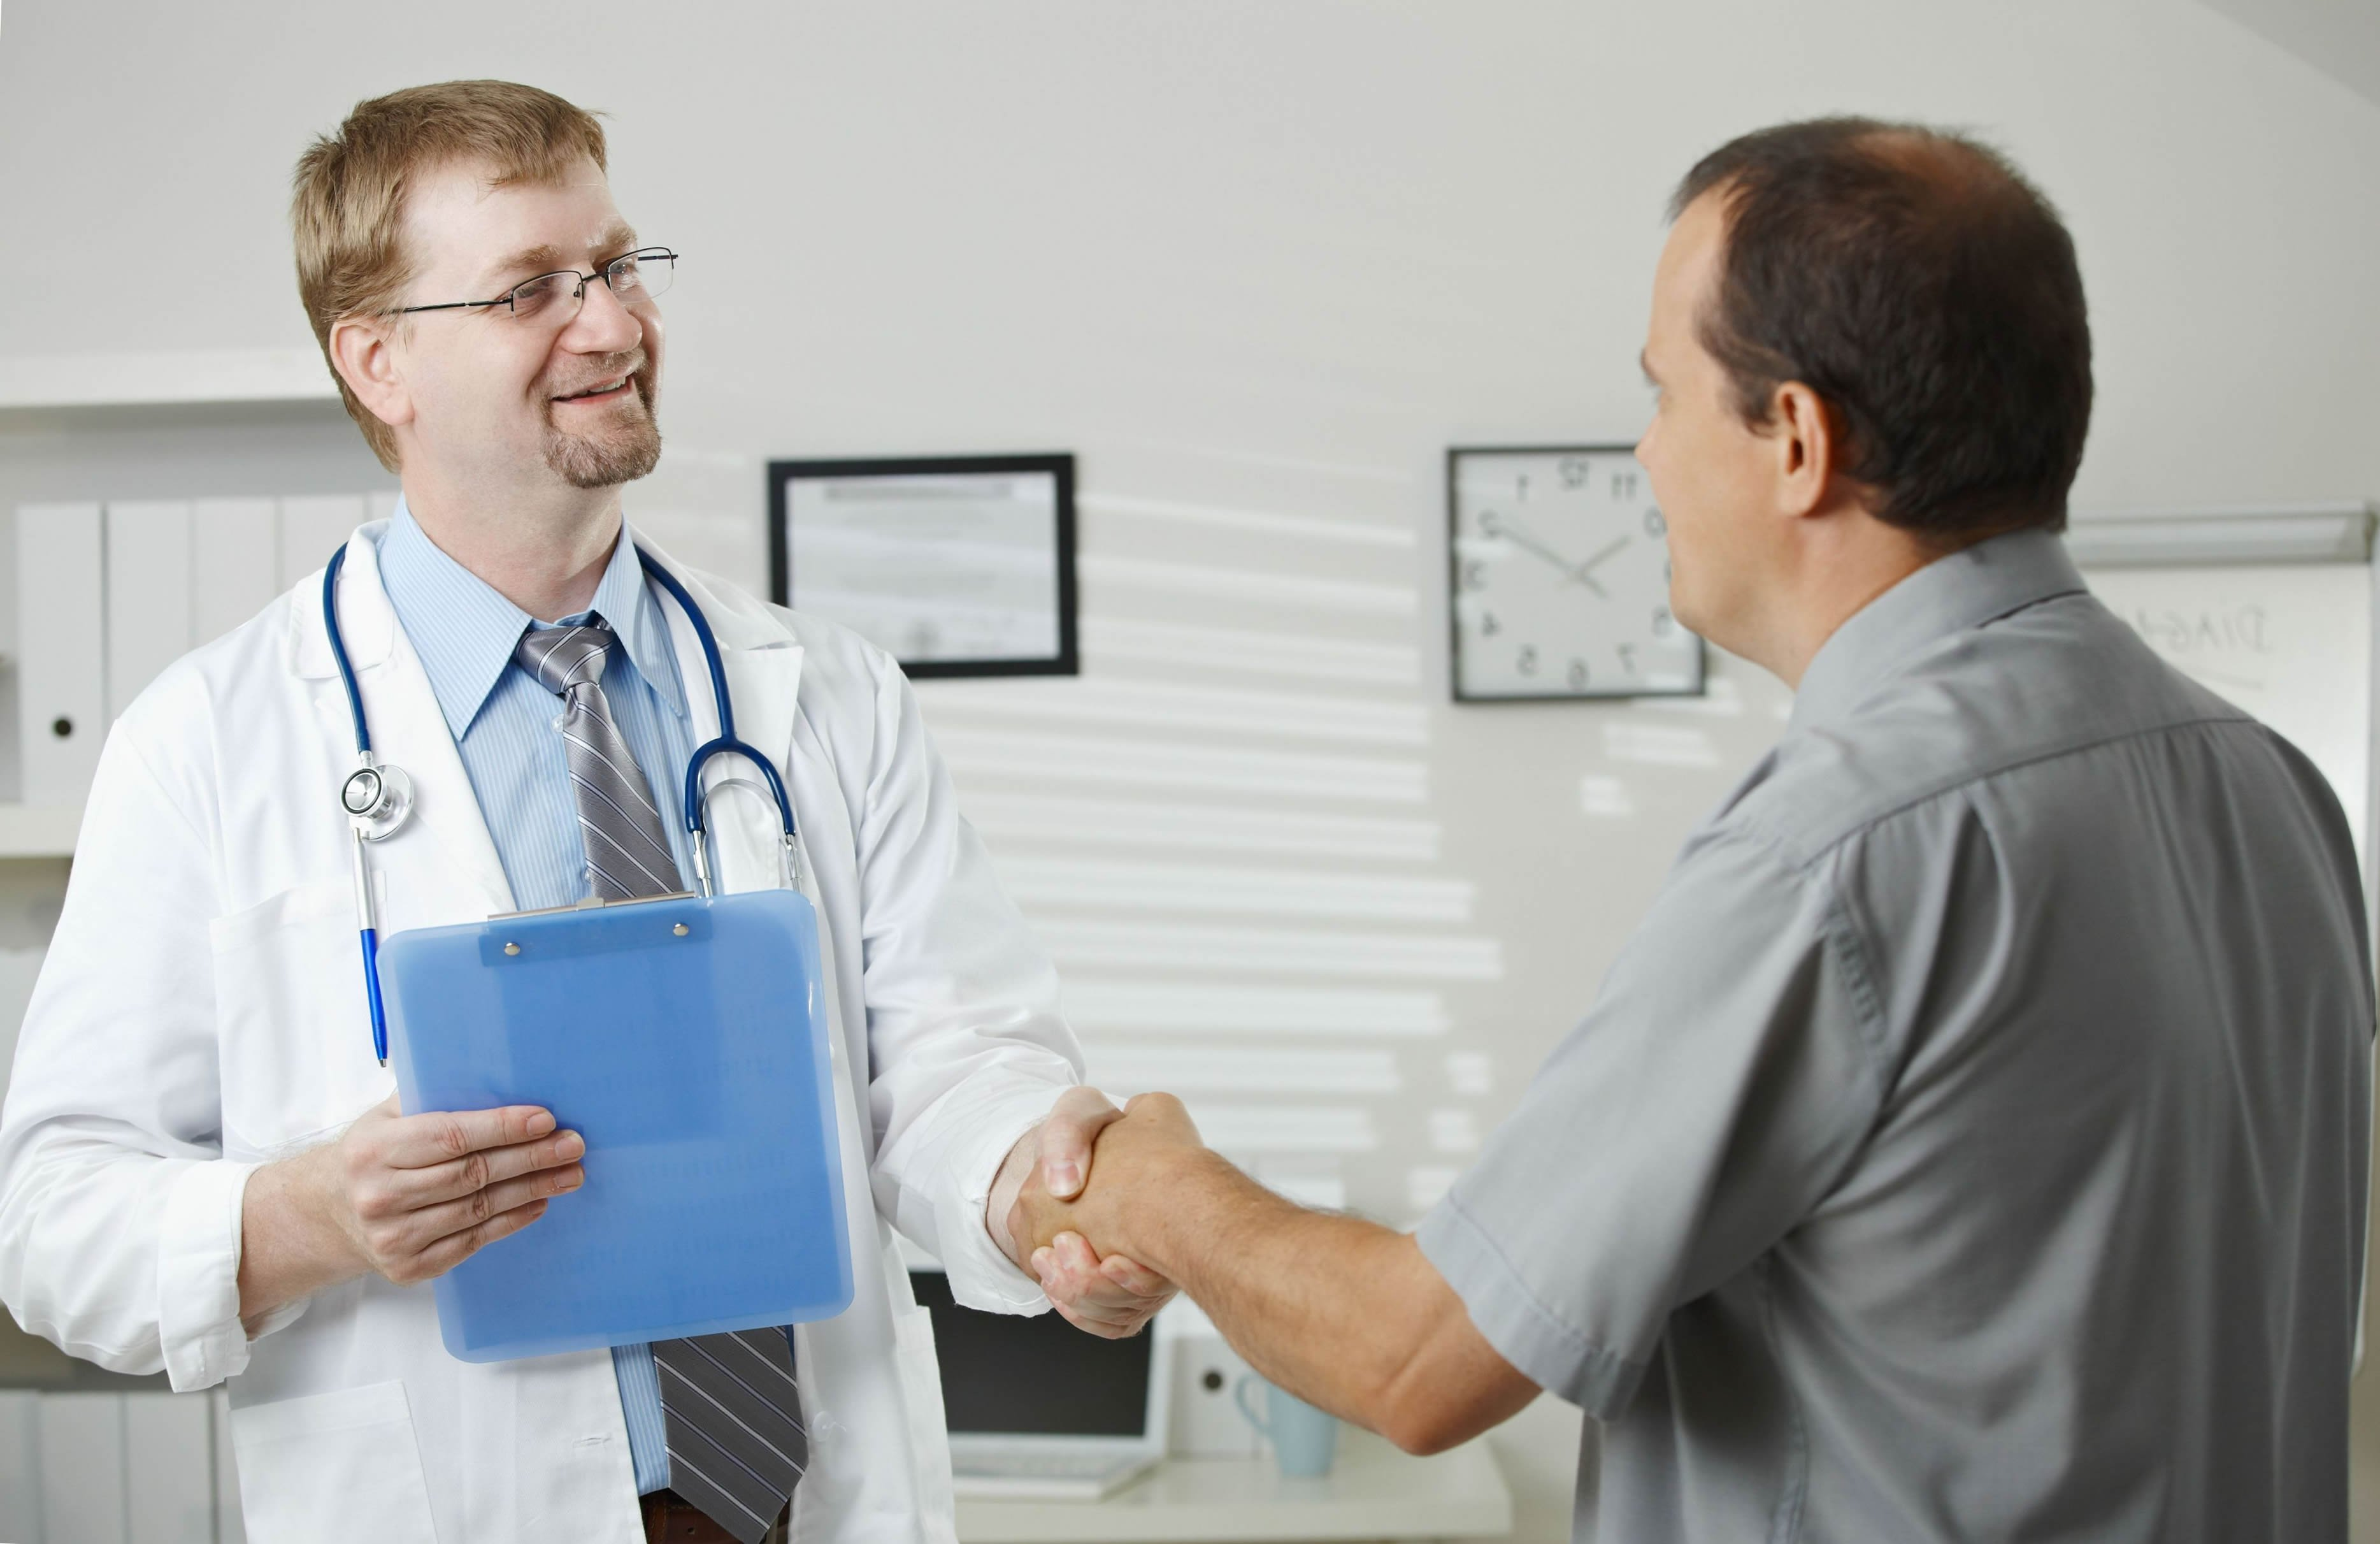 На осмотре у врача у мужика встал онлайн